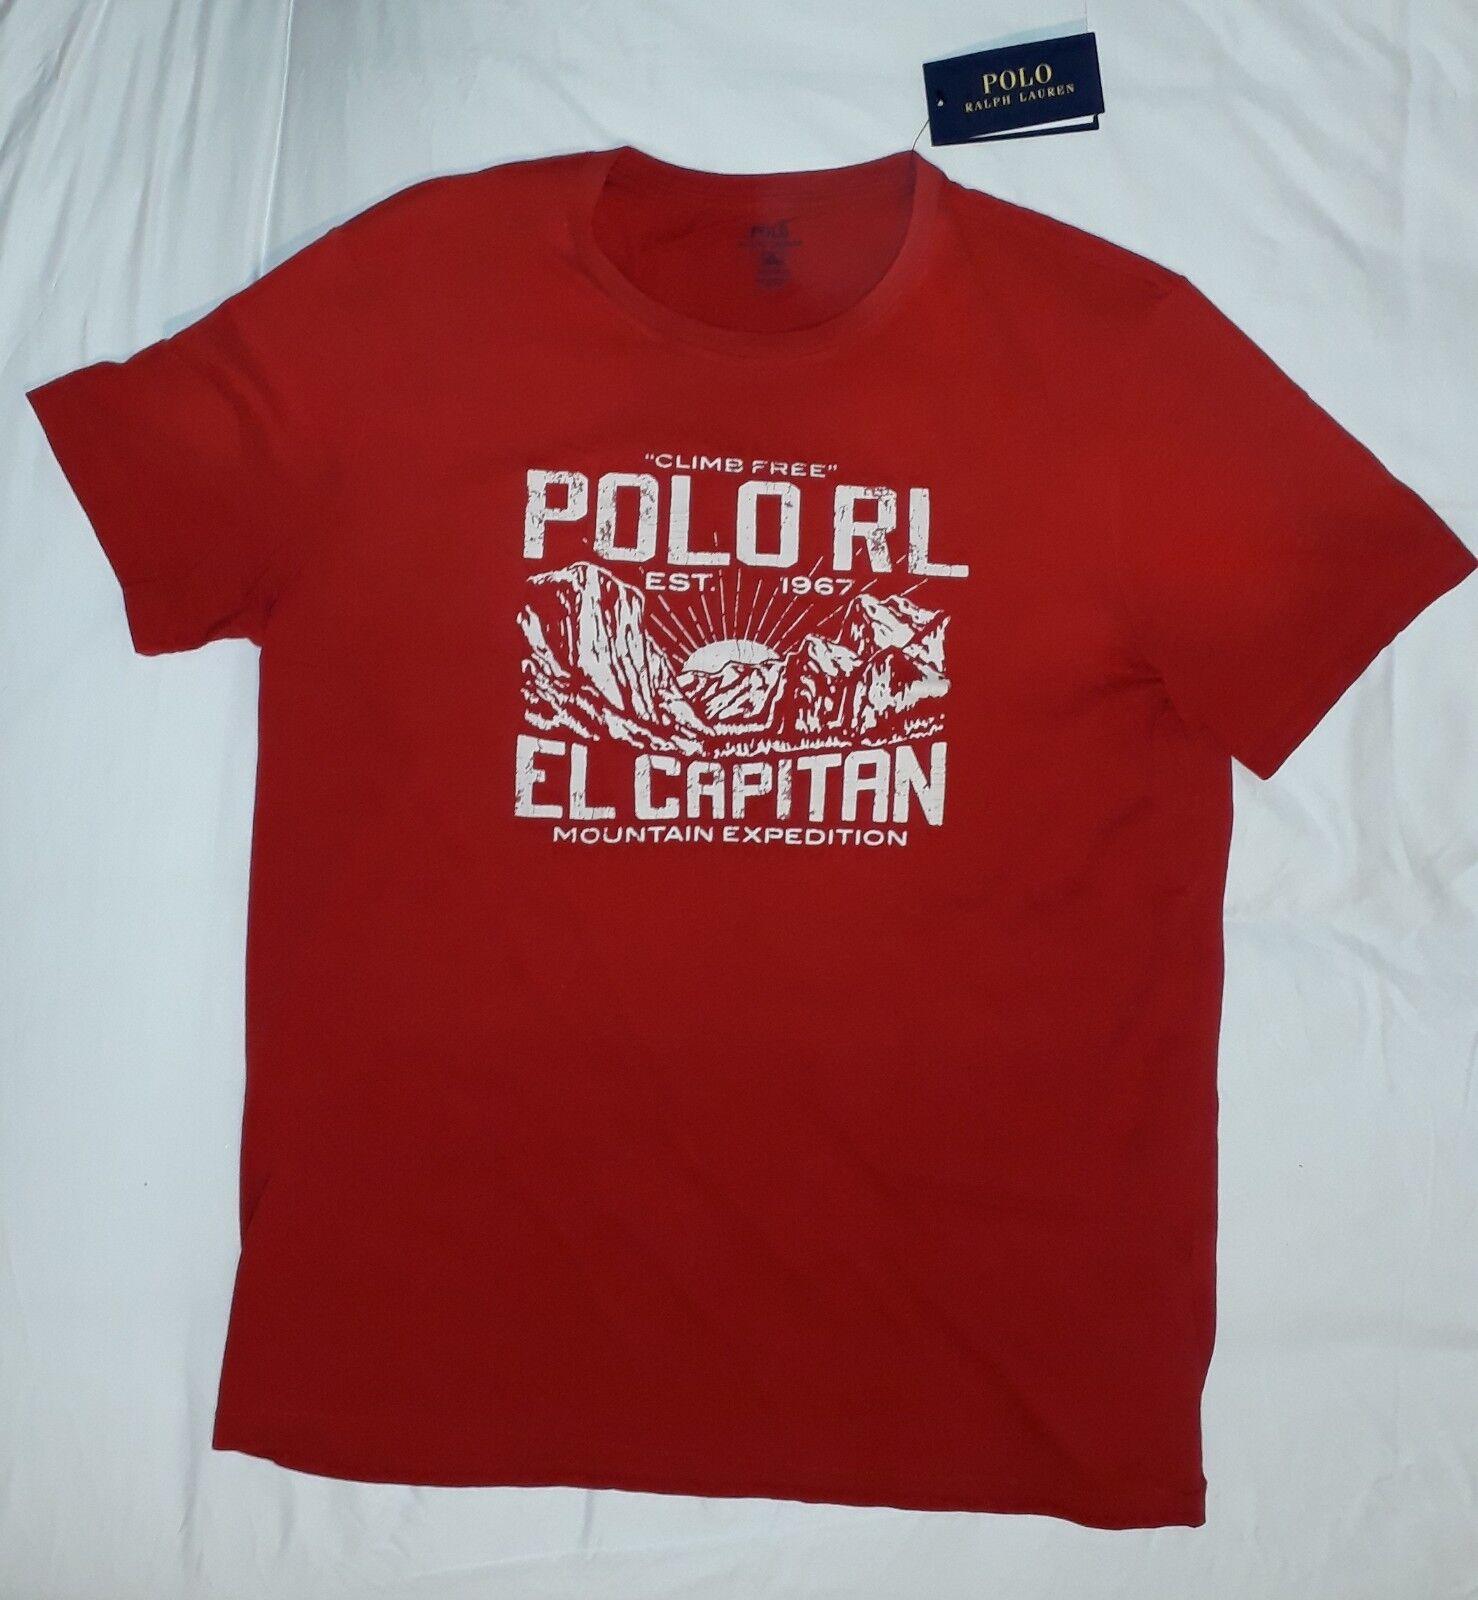 POLO Ralph Lauren salita rosso T SHIRT XL EL CAPITAN Alpine neve spiaggia